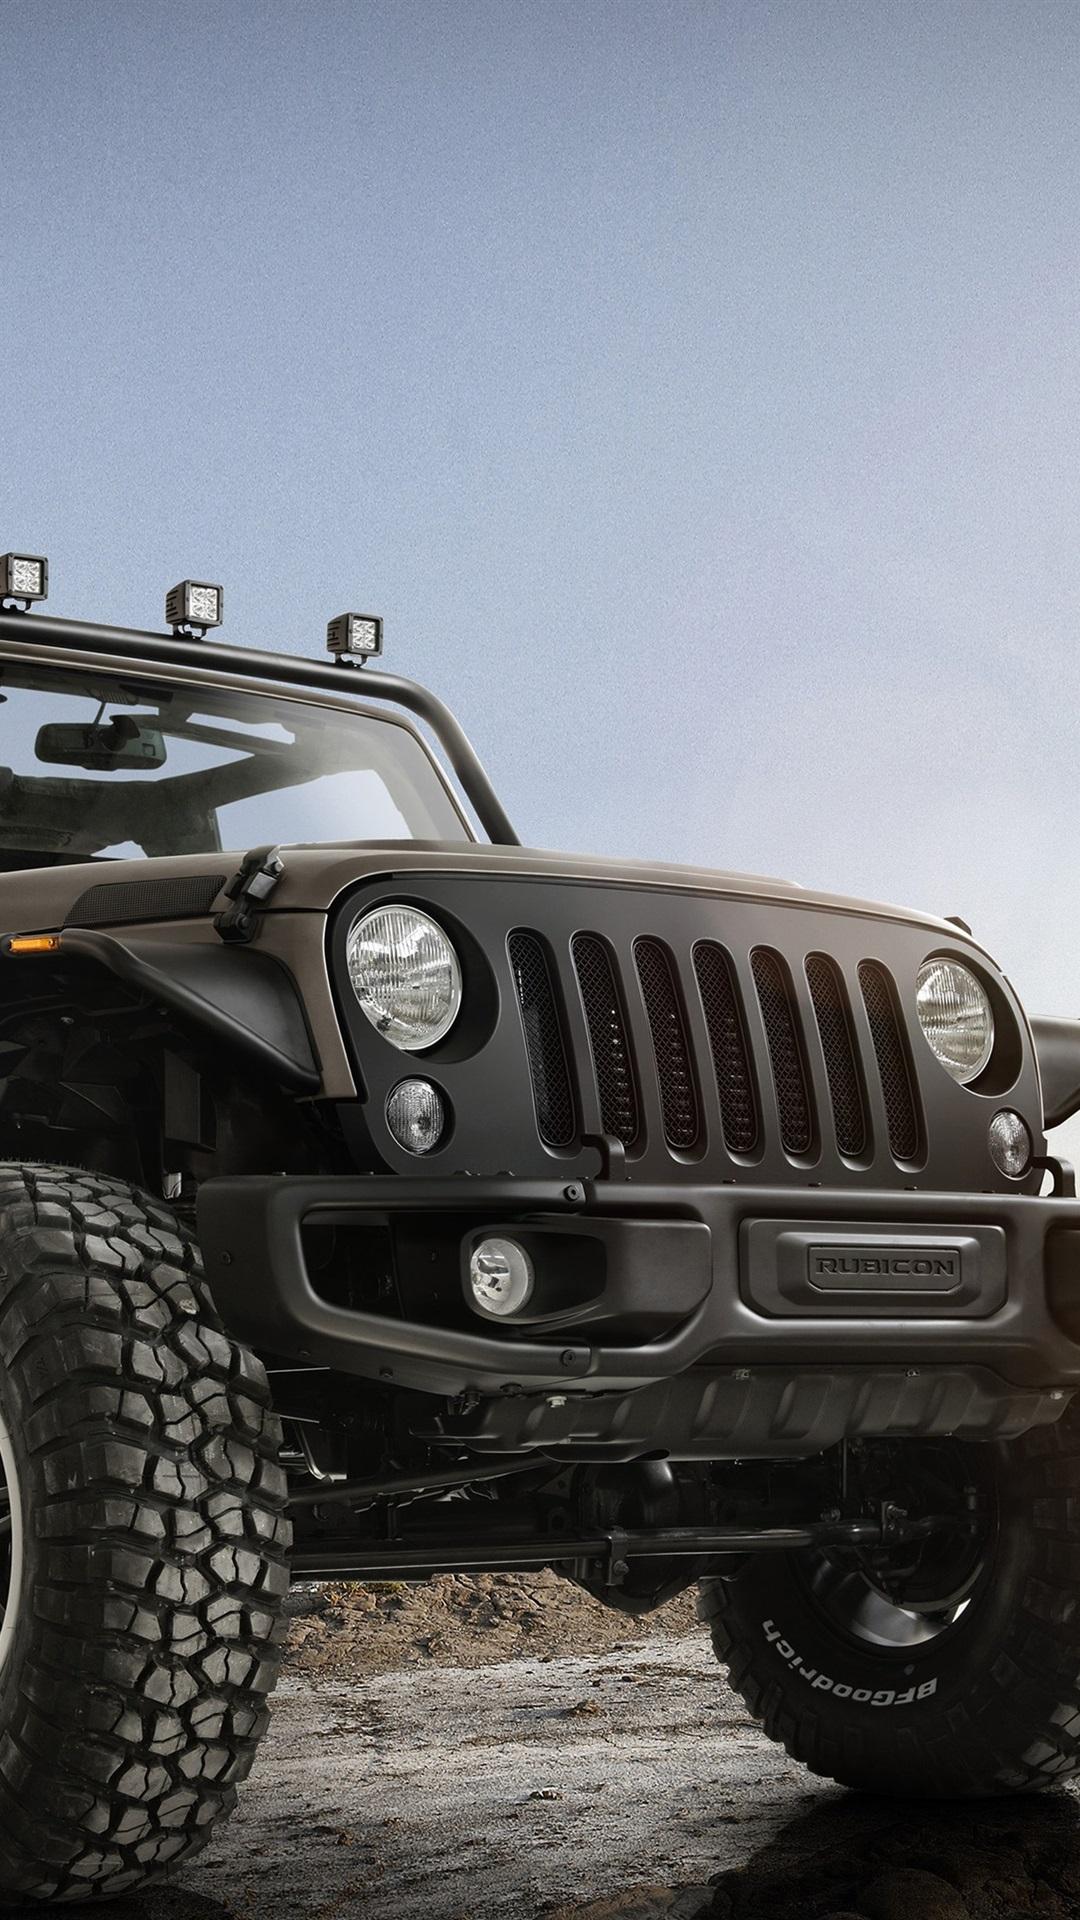 Jeep Unlimited Rubicon >> 壁纸 Jeep牧马人Rubicon无限隐身皮卡 3840x2160 UHD 4K 高清壁纸, 图片, 照片